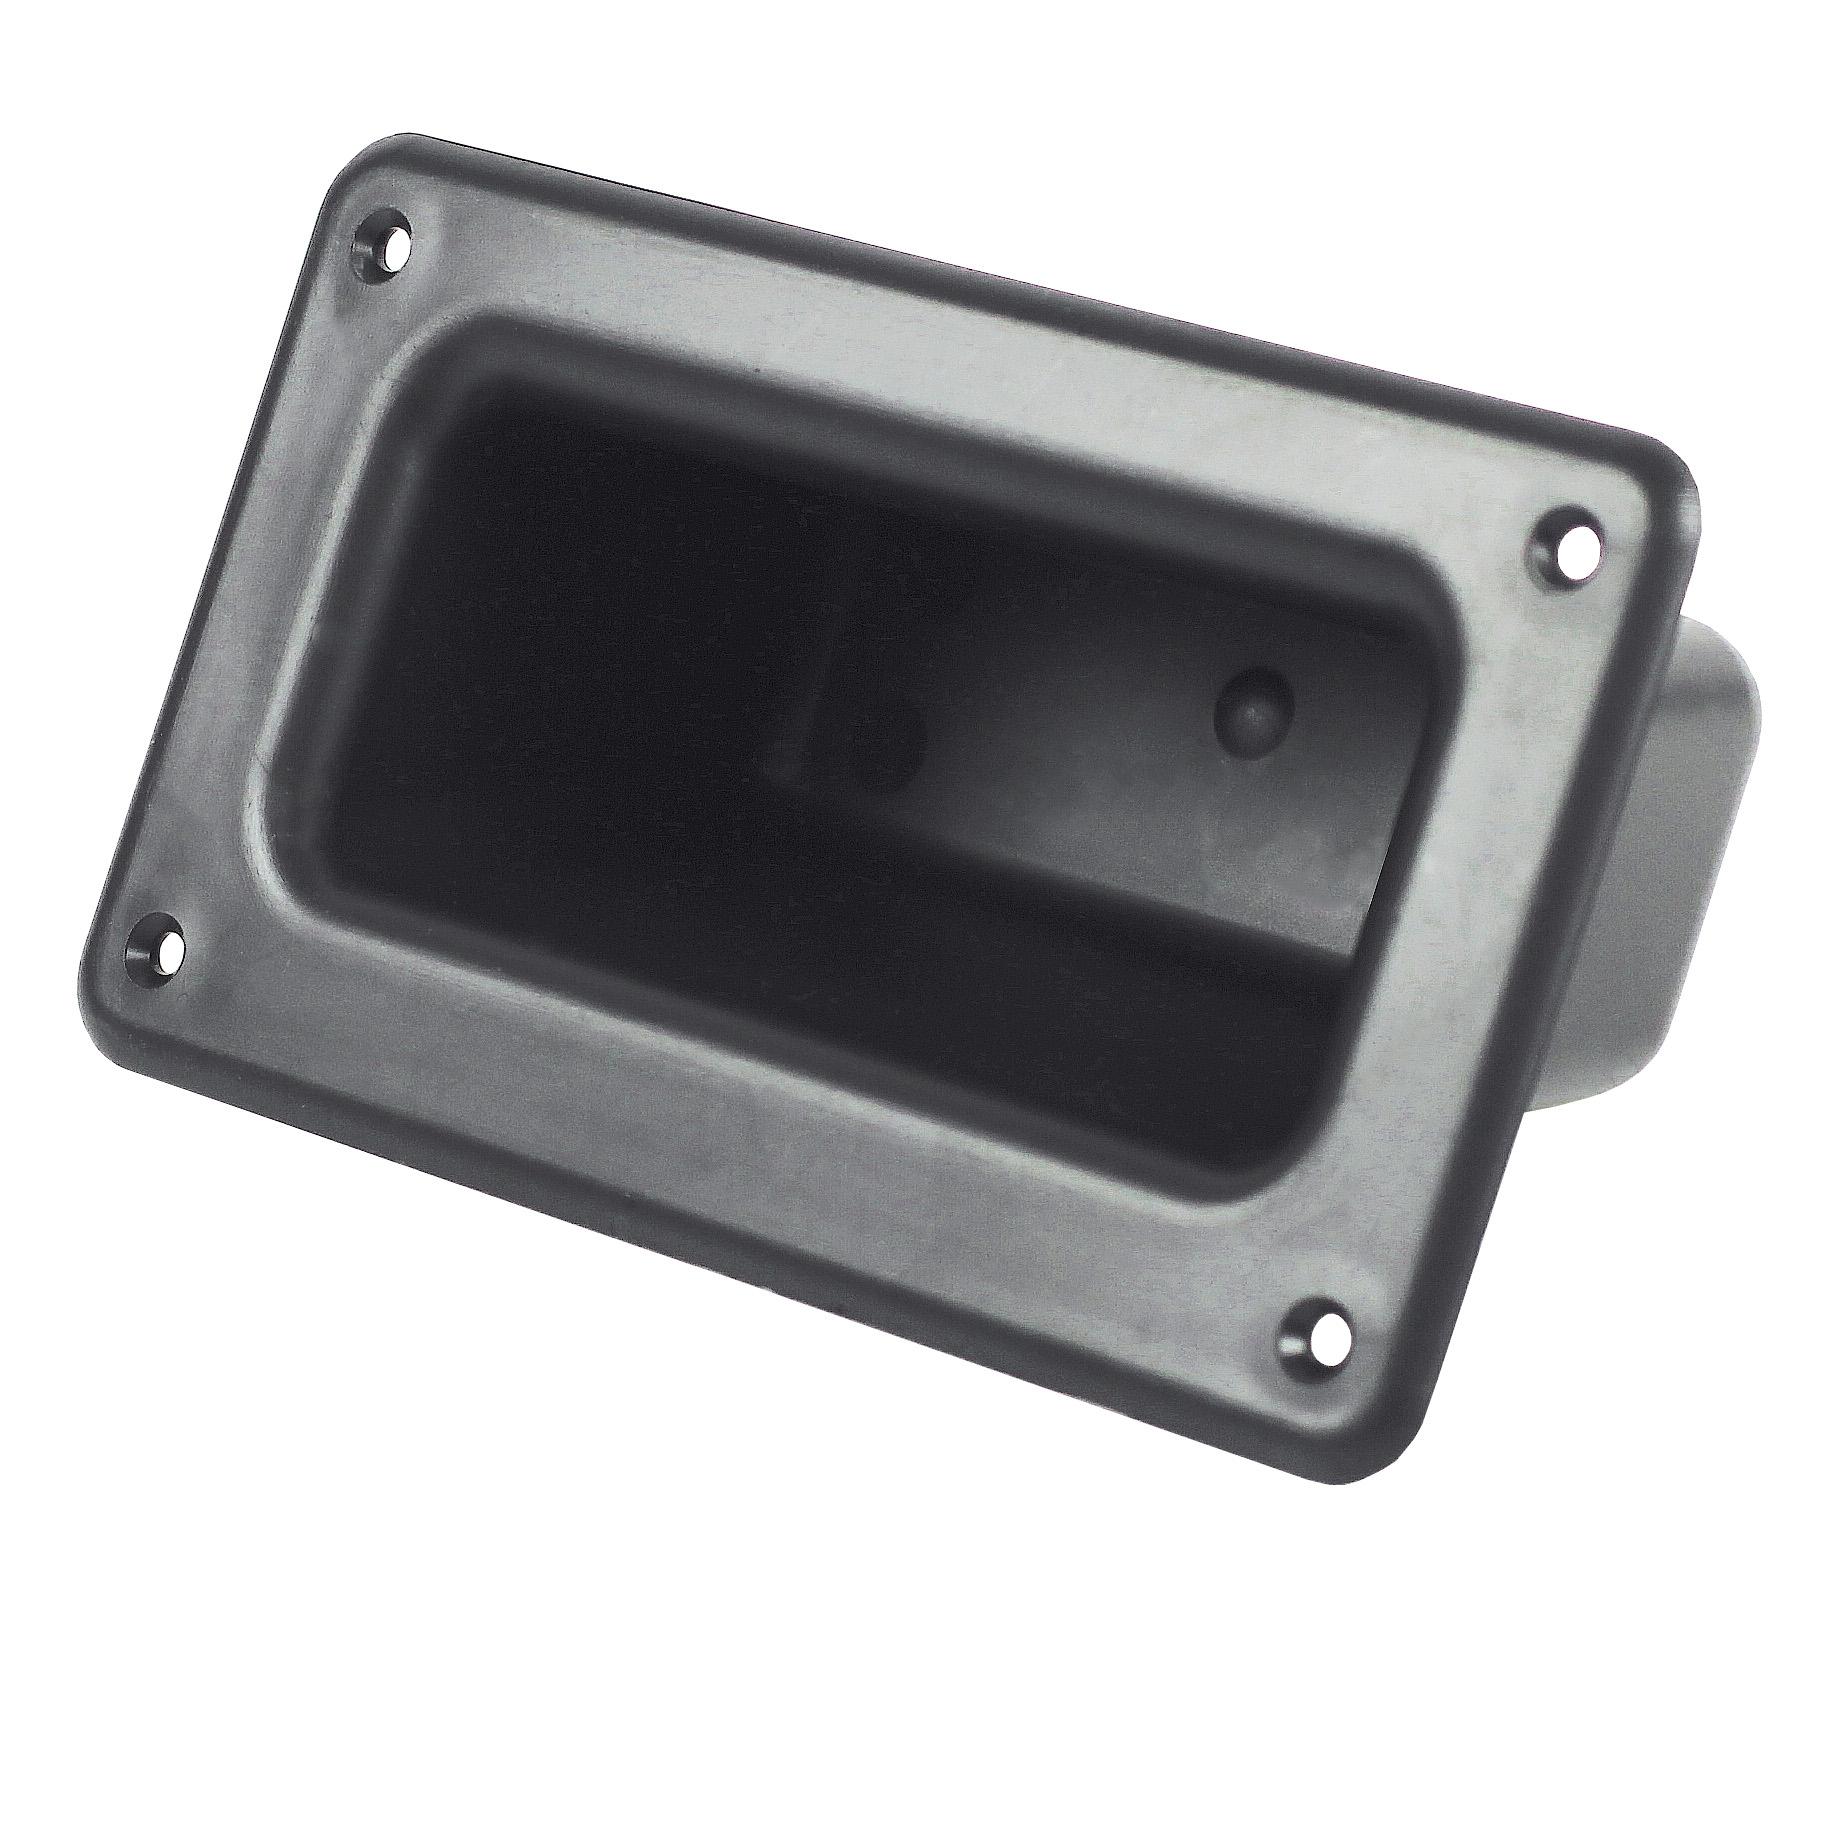 Recessed handle - screw fixing - Thermoplastic -